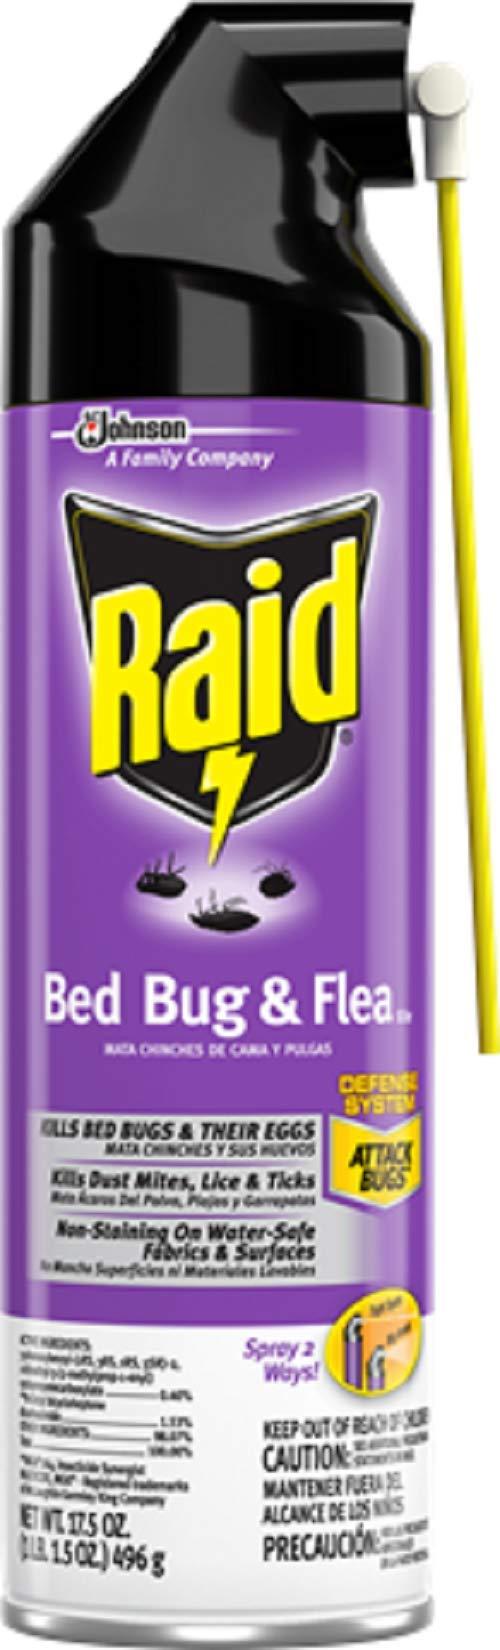 Raid Bed Bug Detector Reviews